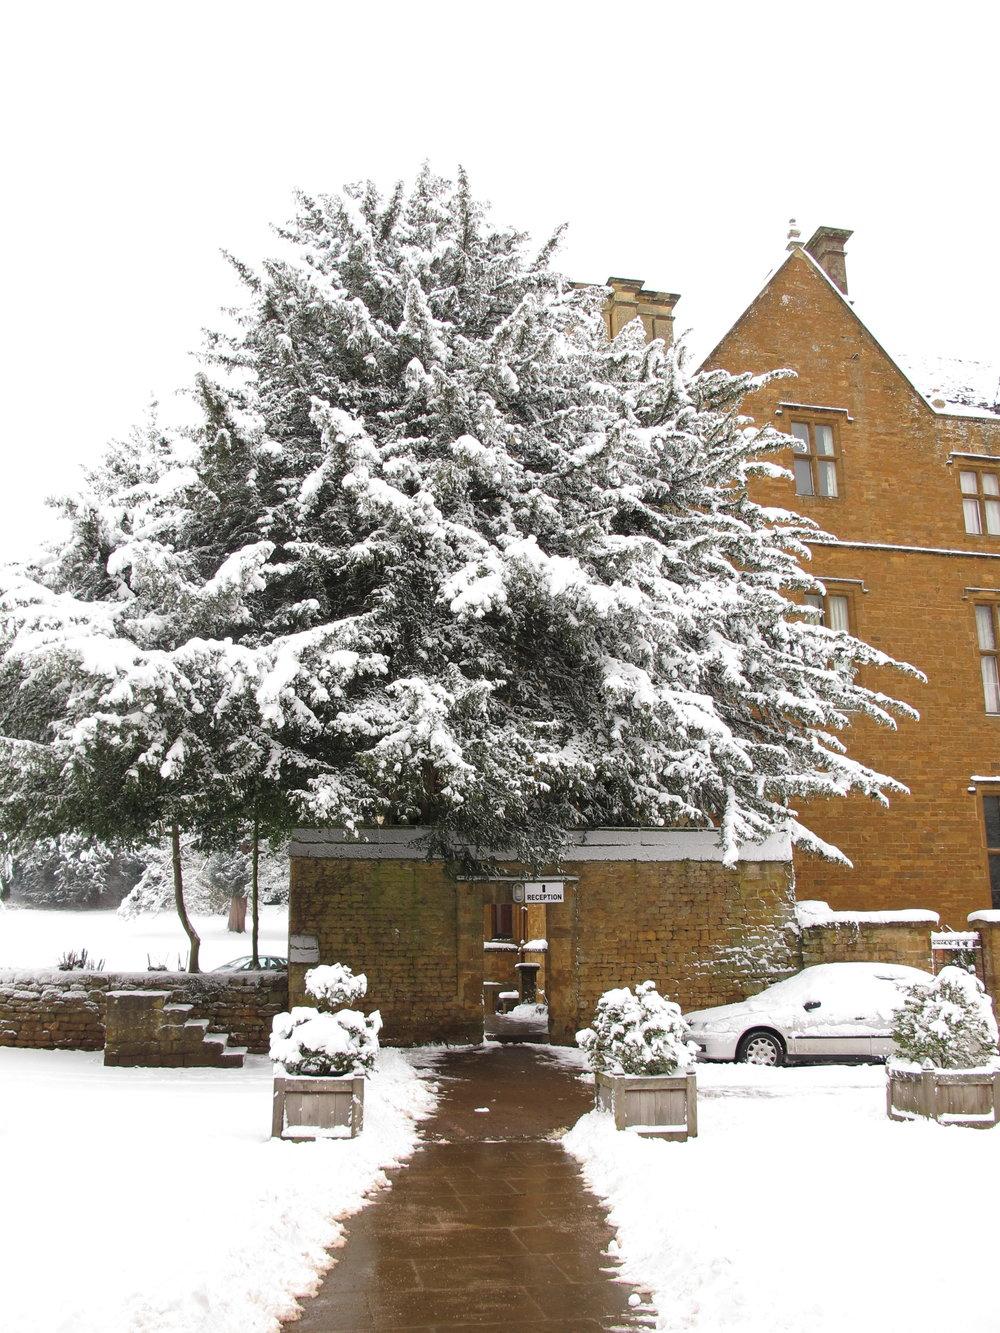 Snowstorm in Wroxton, U.K.